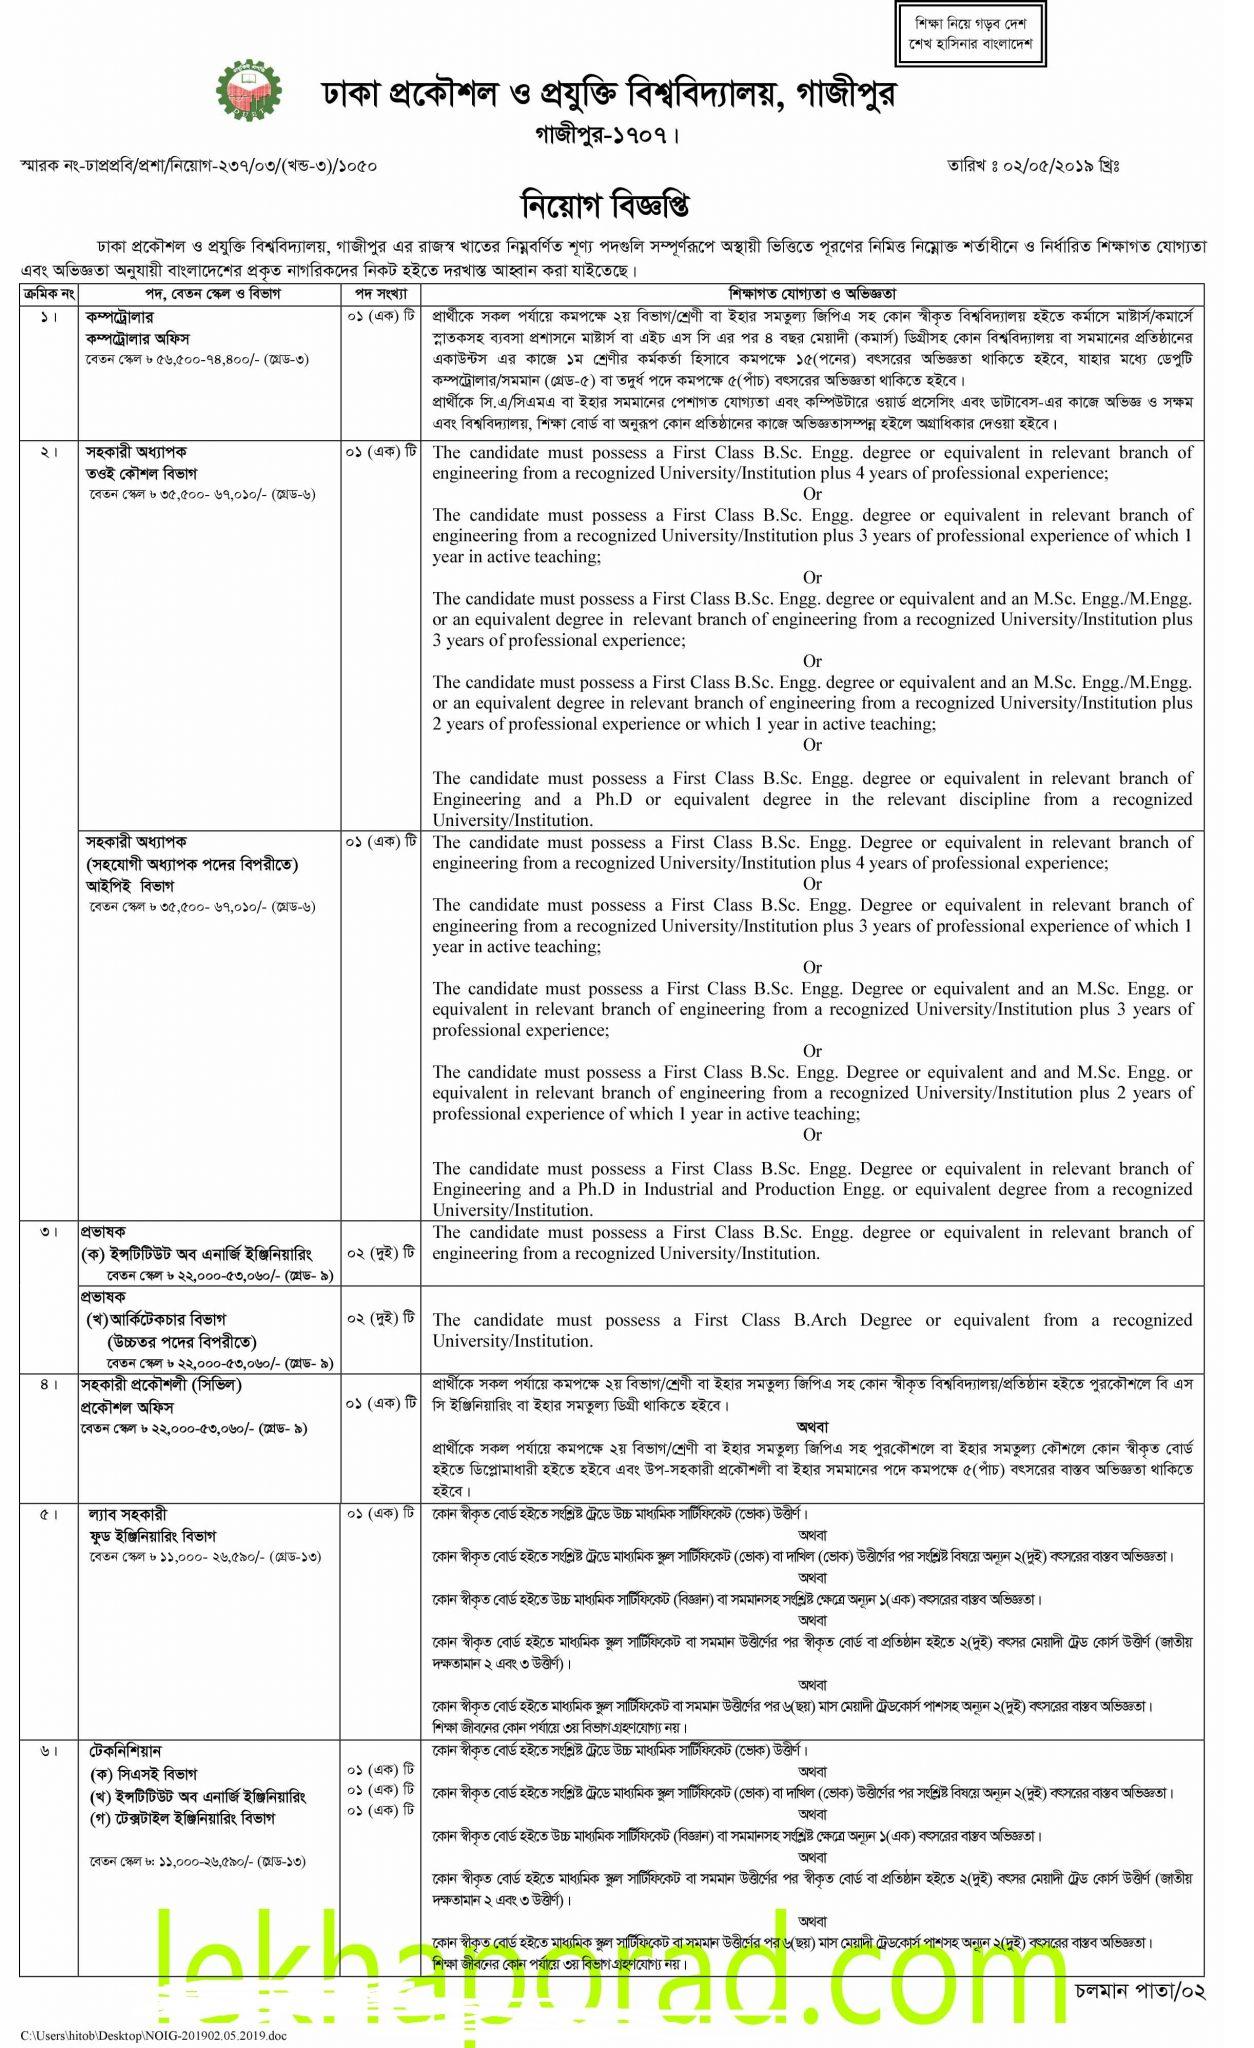 Dhaka University of Engineering & Technology DUET Job Circular 2019